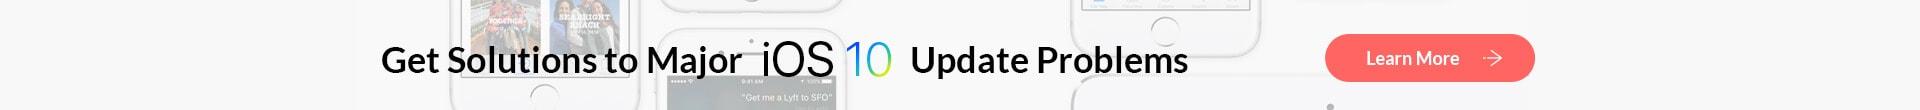 iOS 10 update failed - fix it